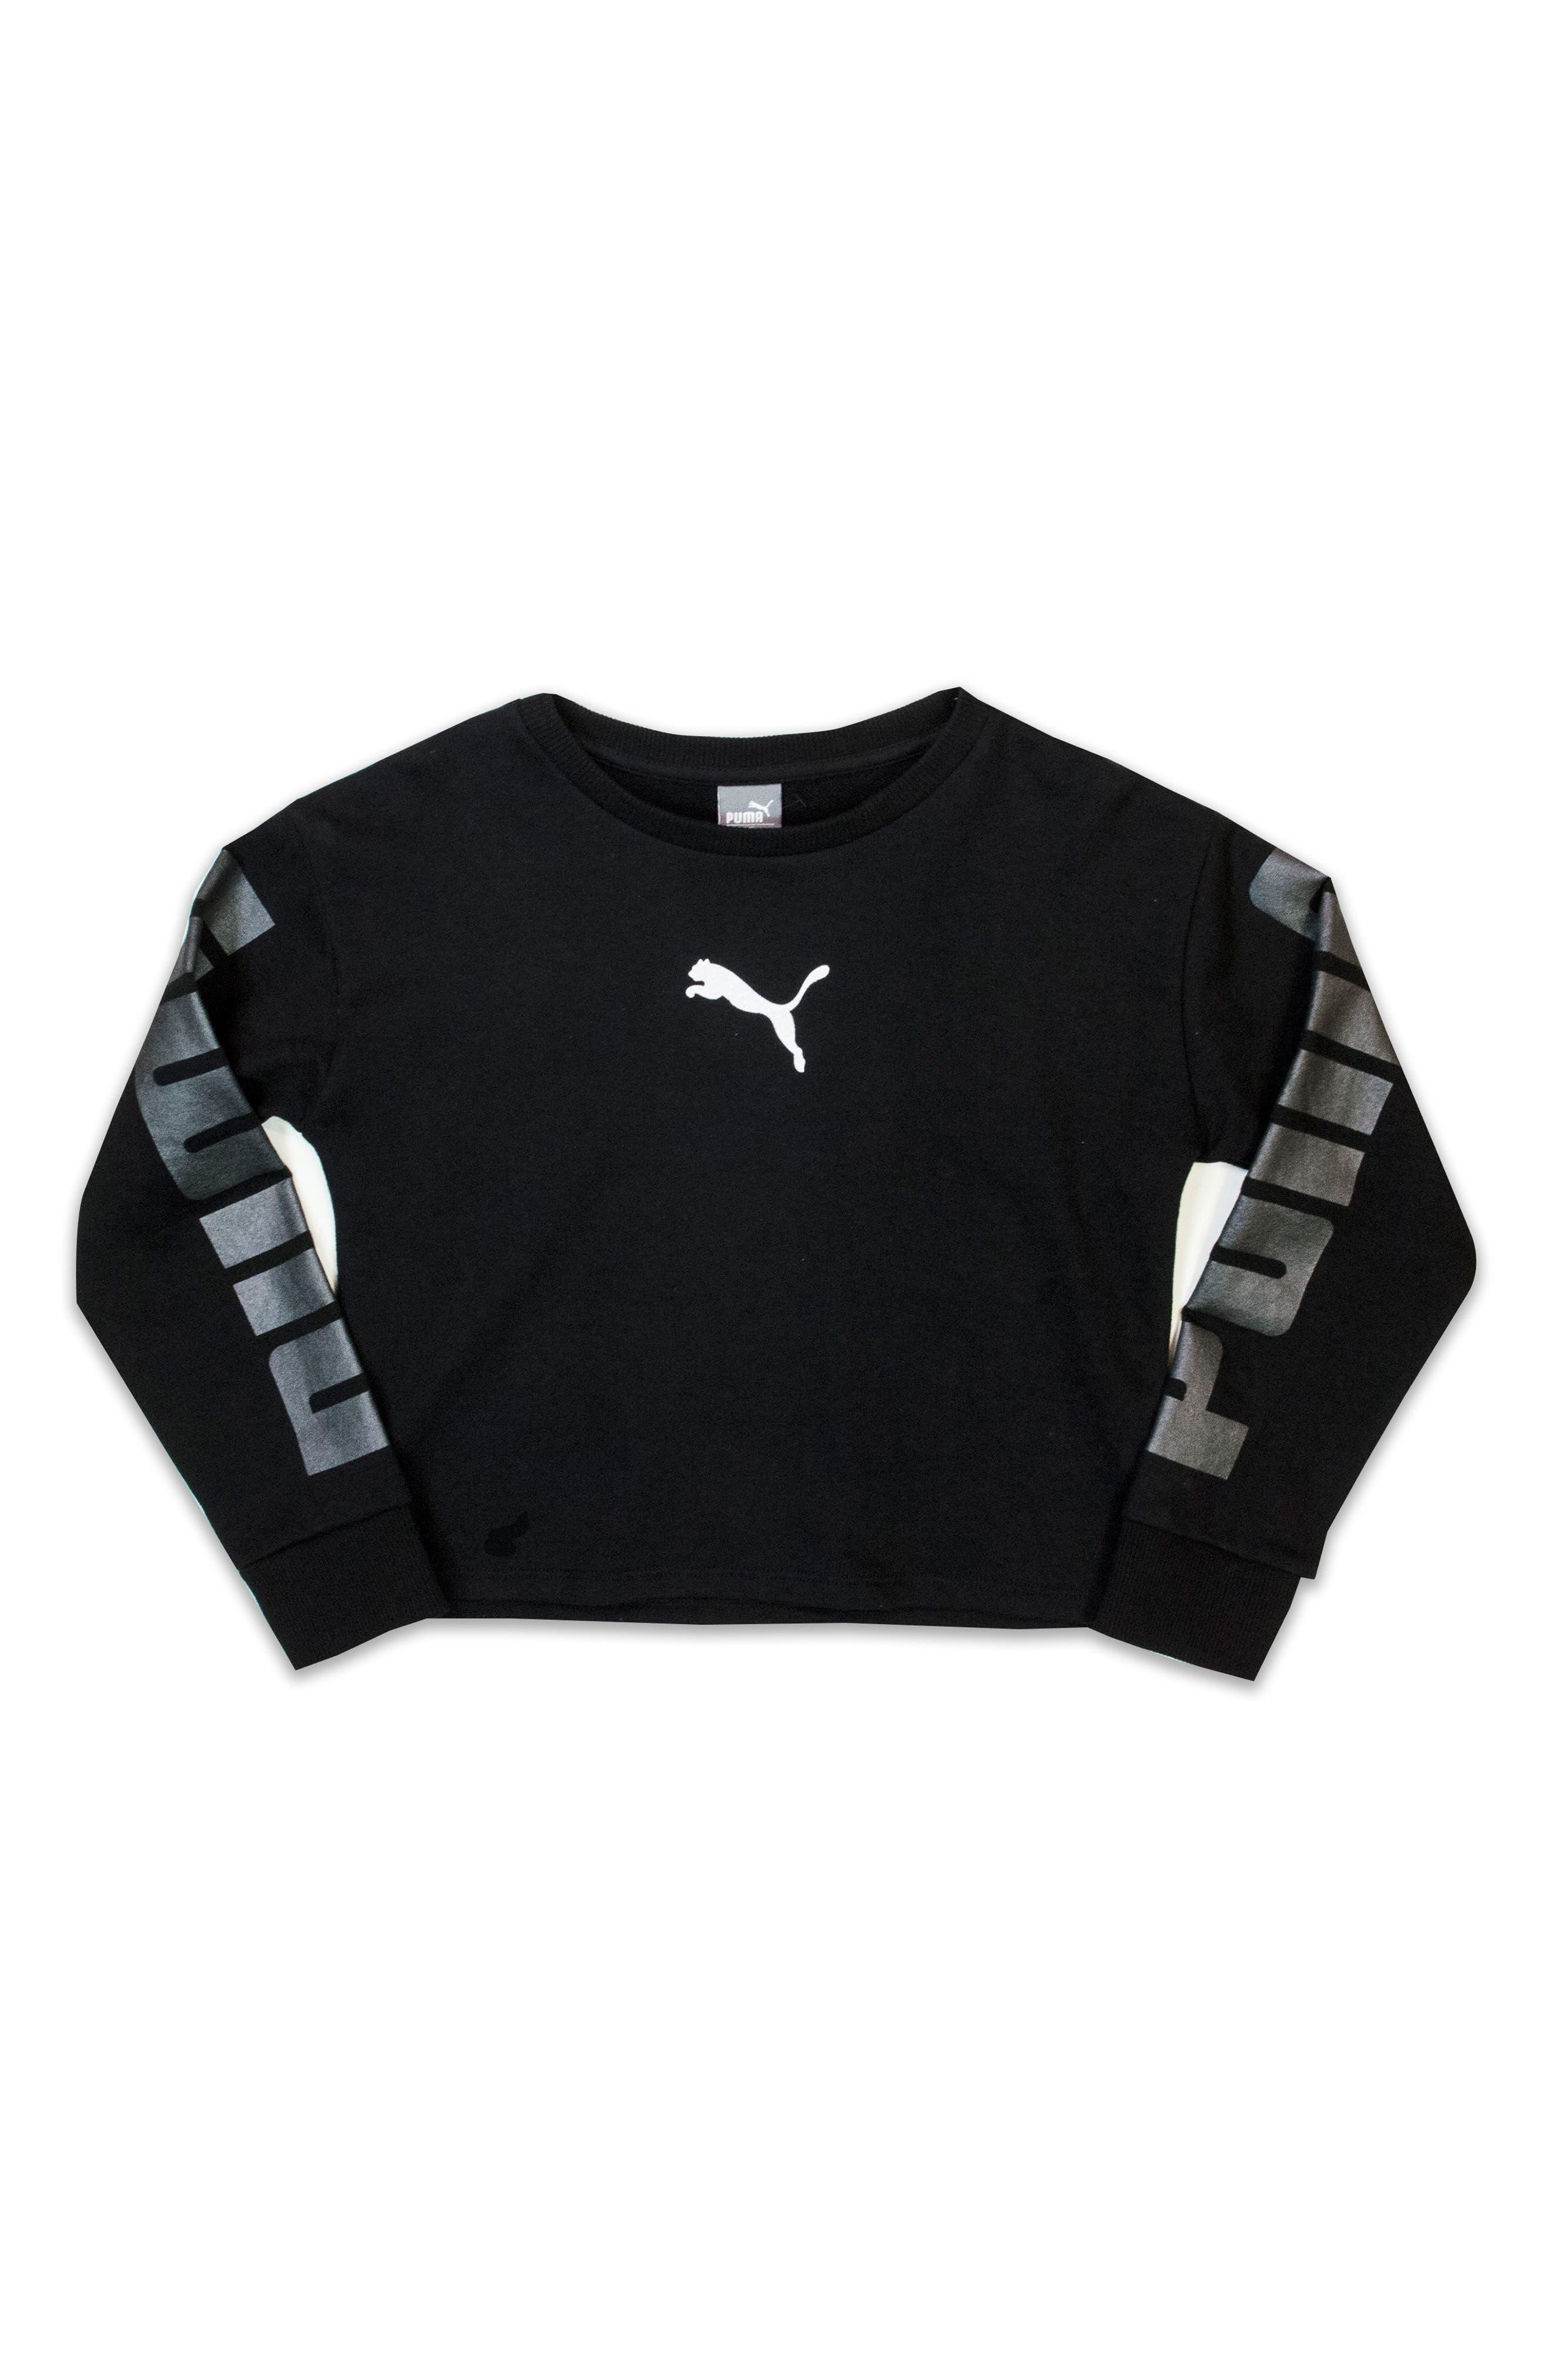 Alternate Image 1 Selected - PUMA French Terry Sweatshirt (Big Girls)